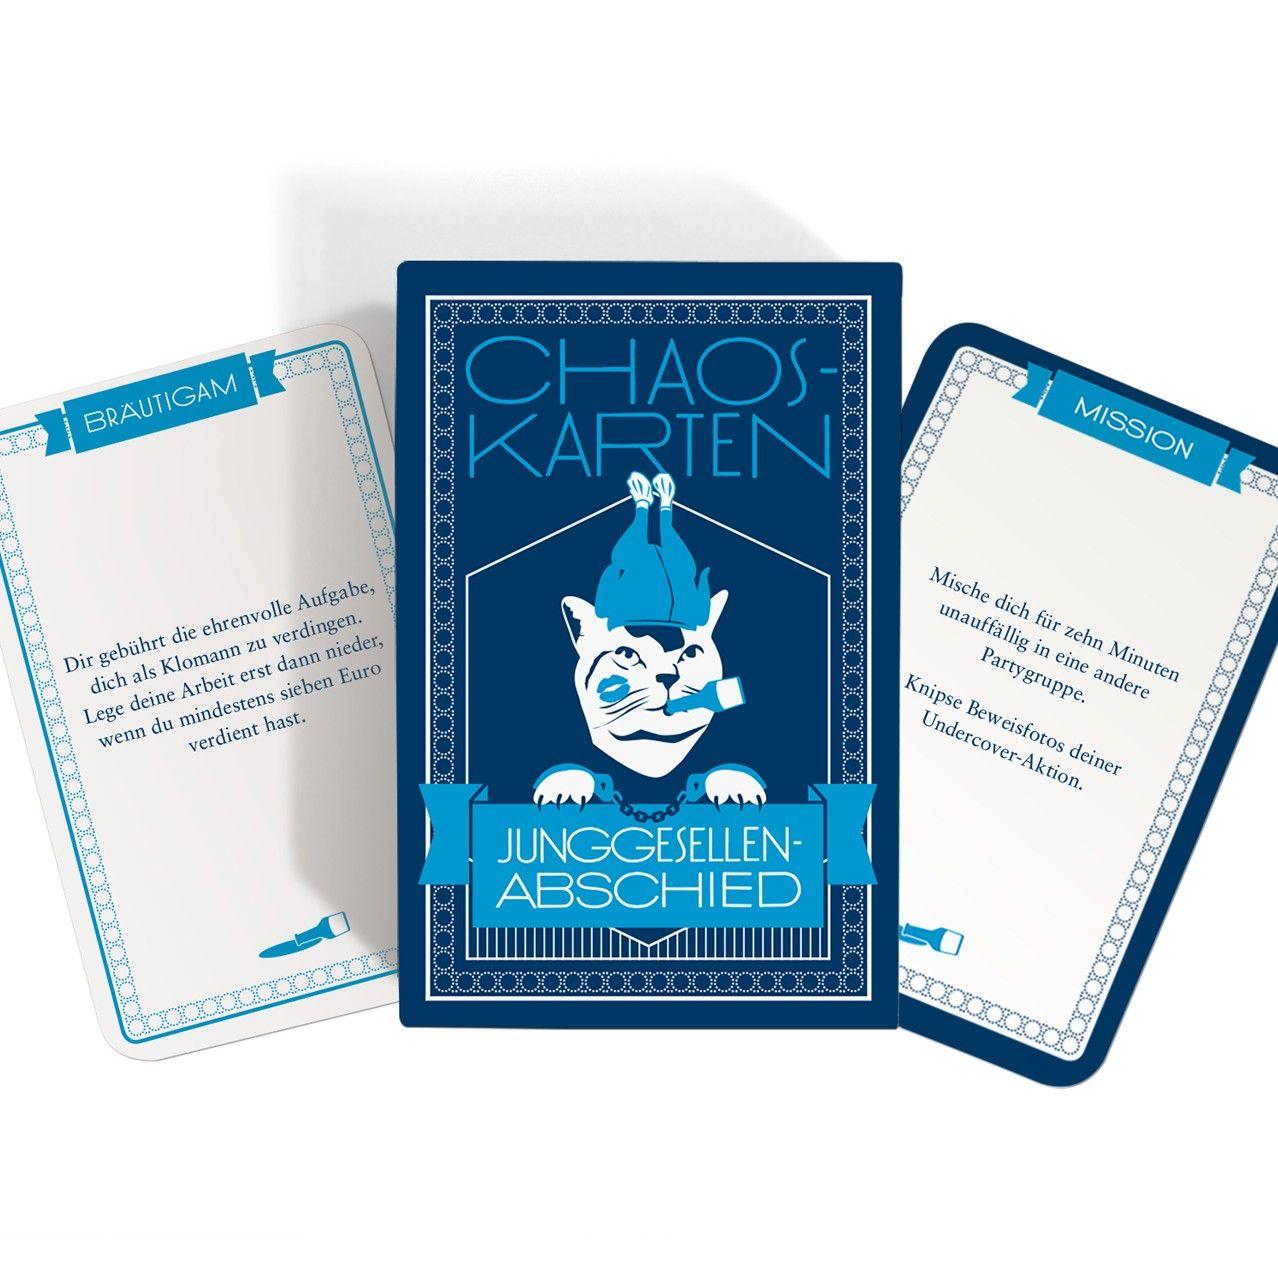 JGA Chaoskarten Junggesellenabschied Spiel   selekkt – Heim für junges Design